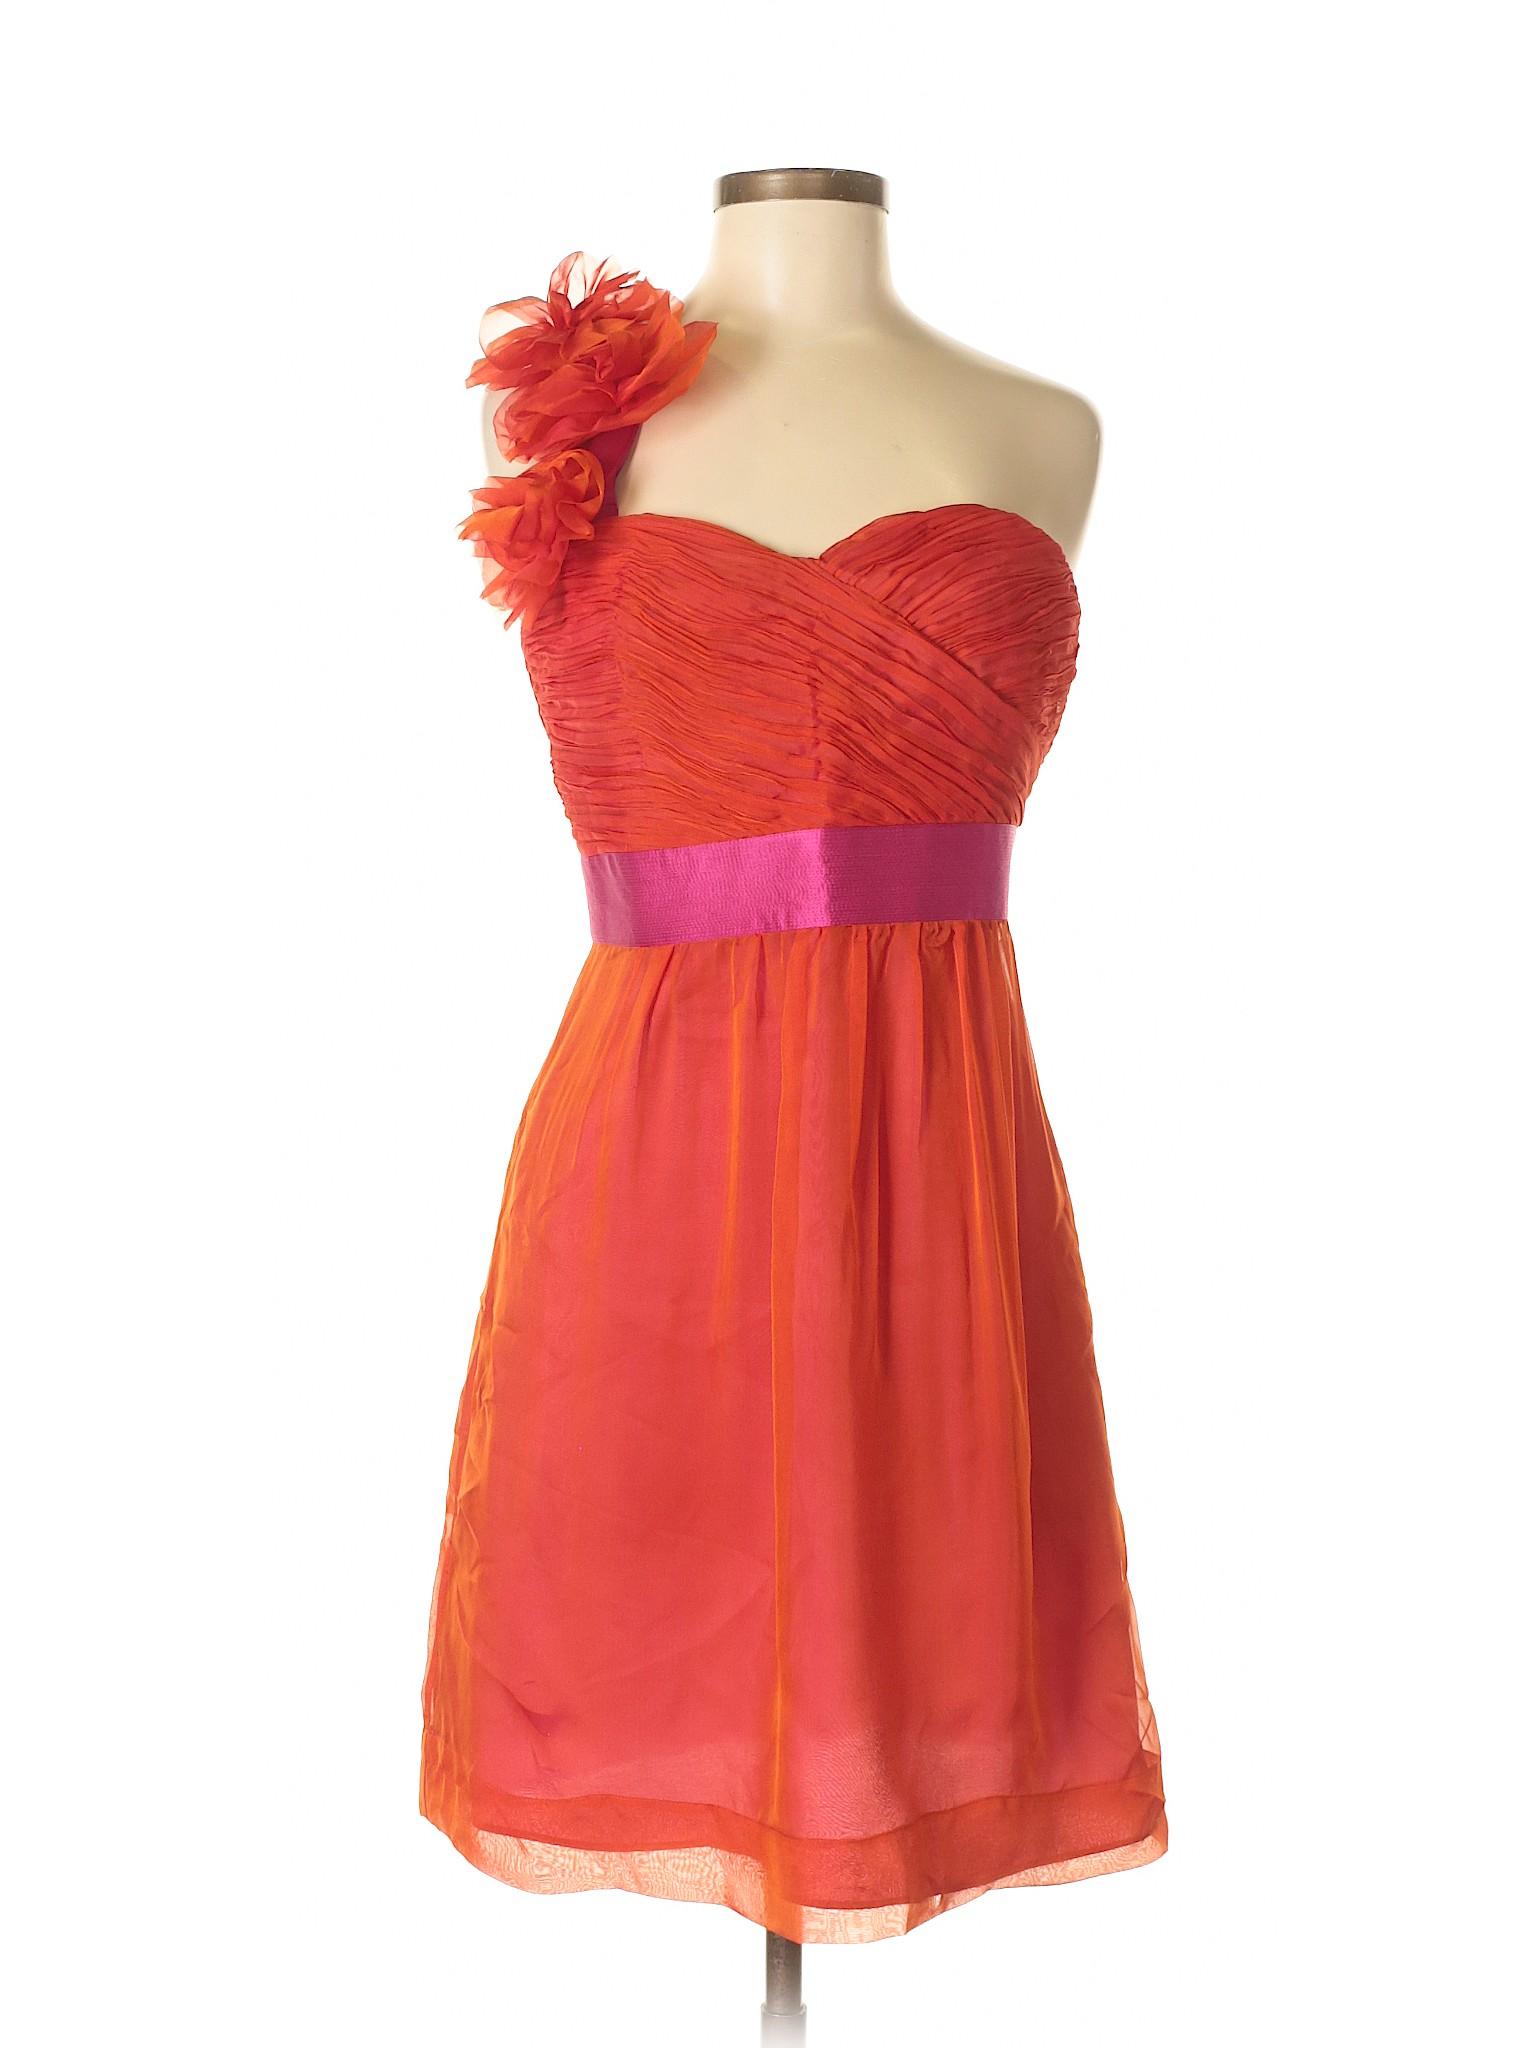 b2dd10b65aa Phoebe Couture Women Orange Cocktail Dress 8